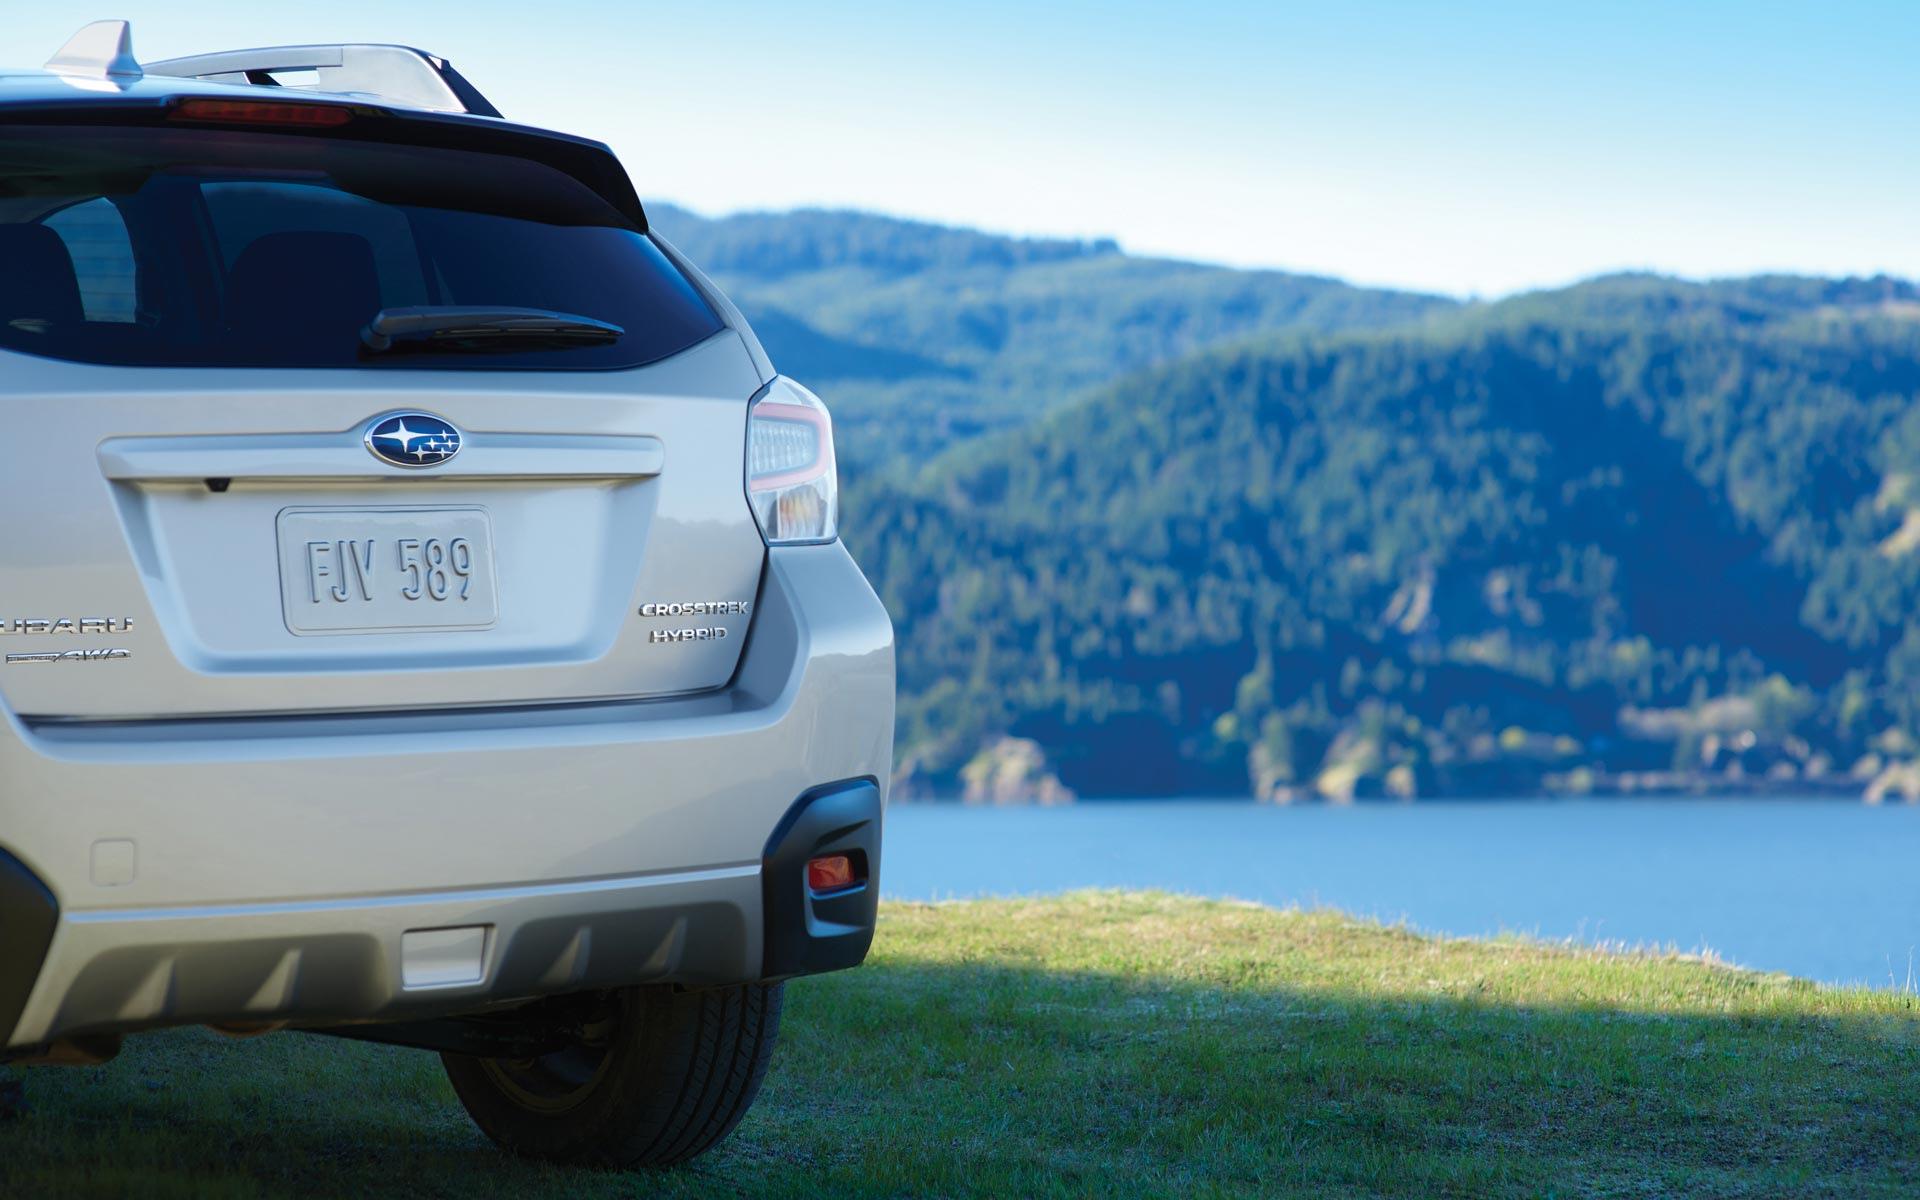 2016 Subaru Crosstrek Hybrid Review - Carrrs Auto Portal